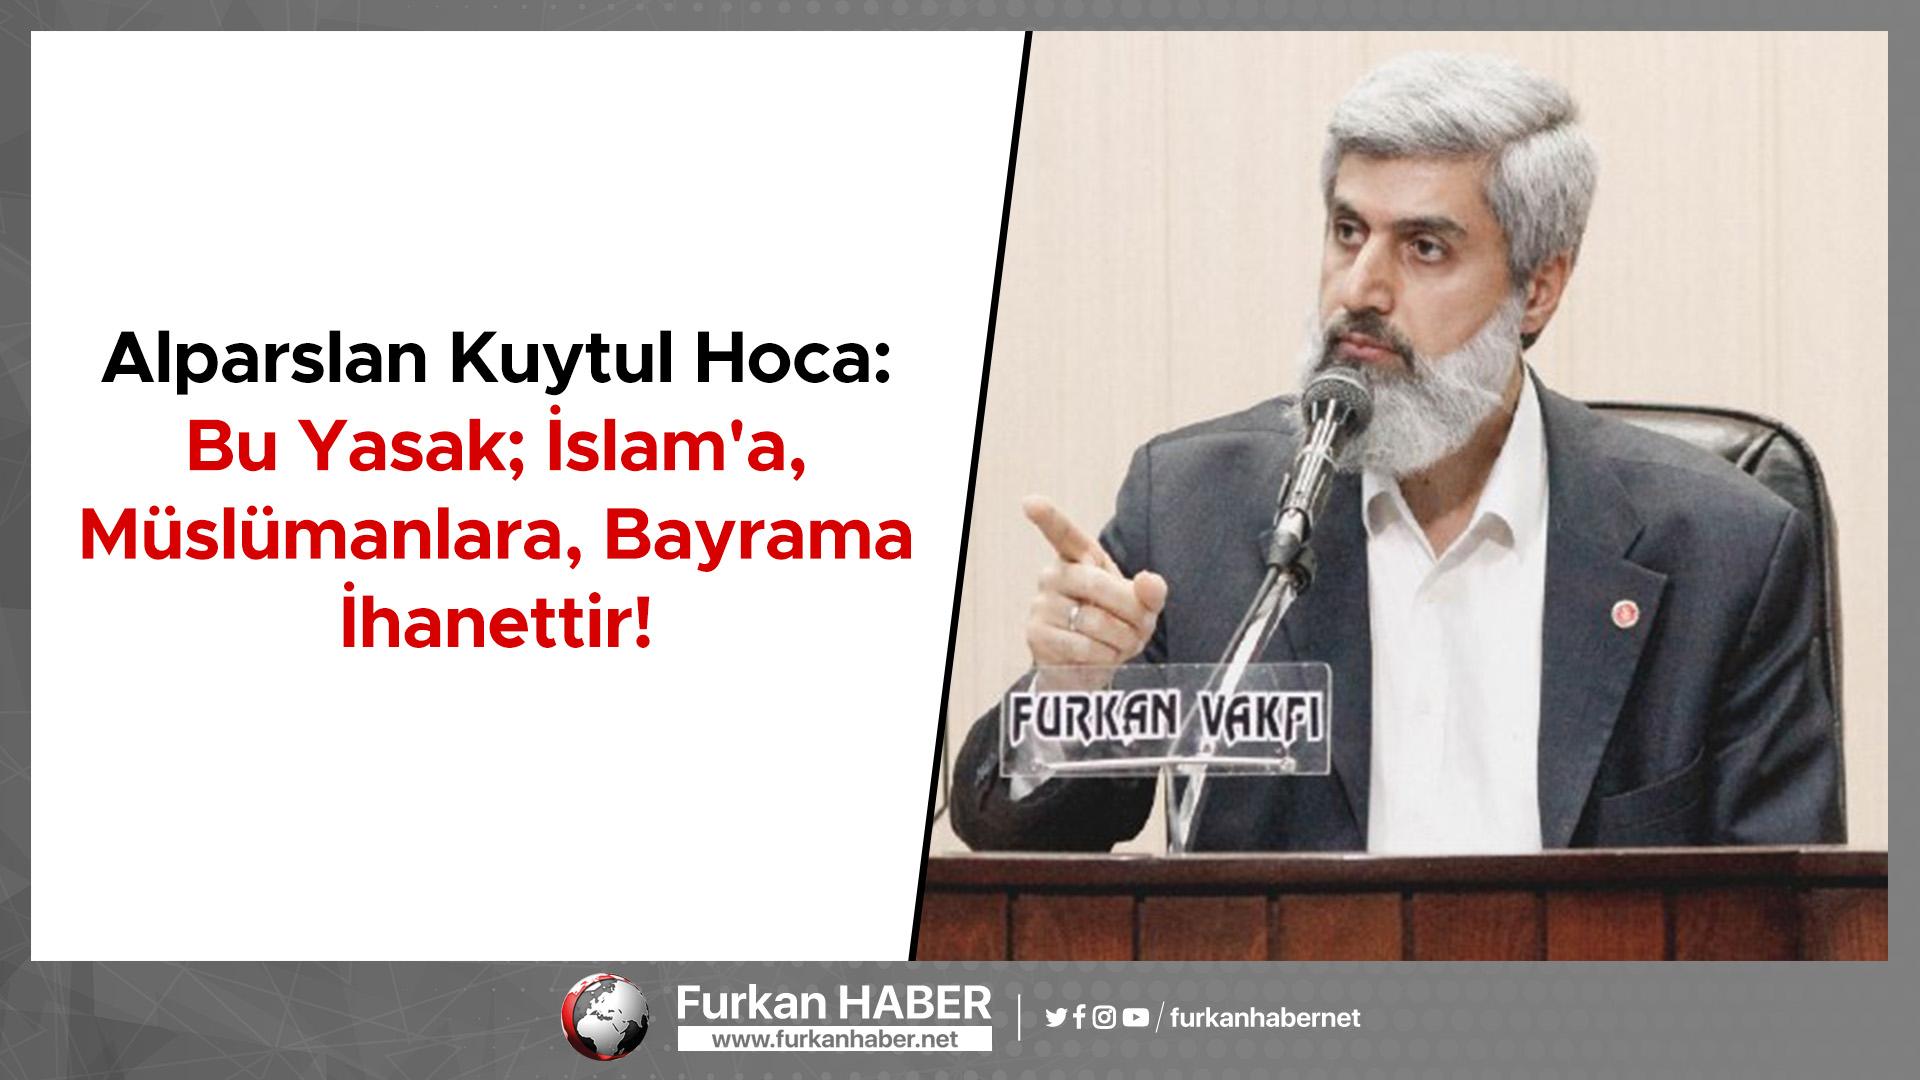 Alparslan Kuytul Hoca: Bu Yasak; İslam'a, Müslümanlara, Bayrama İhanettir!